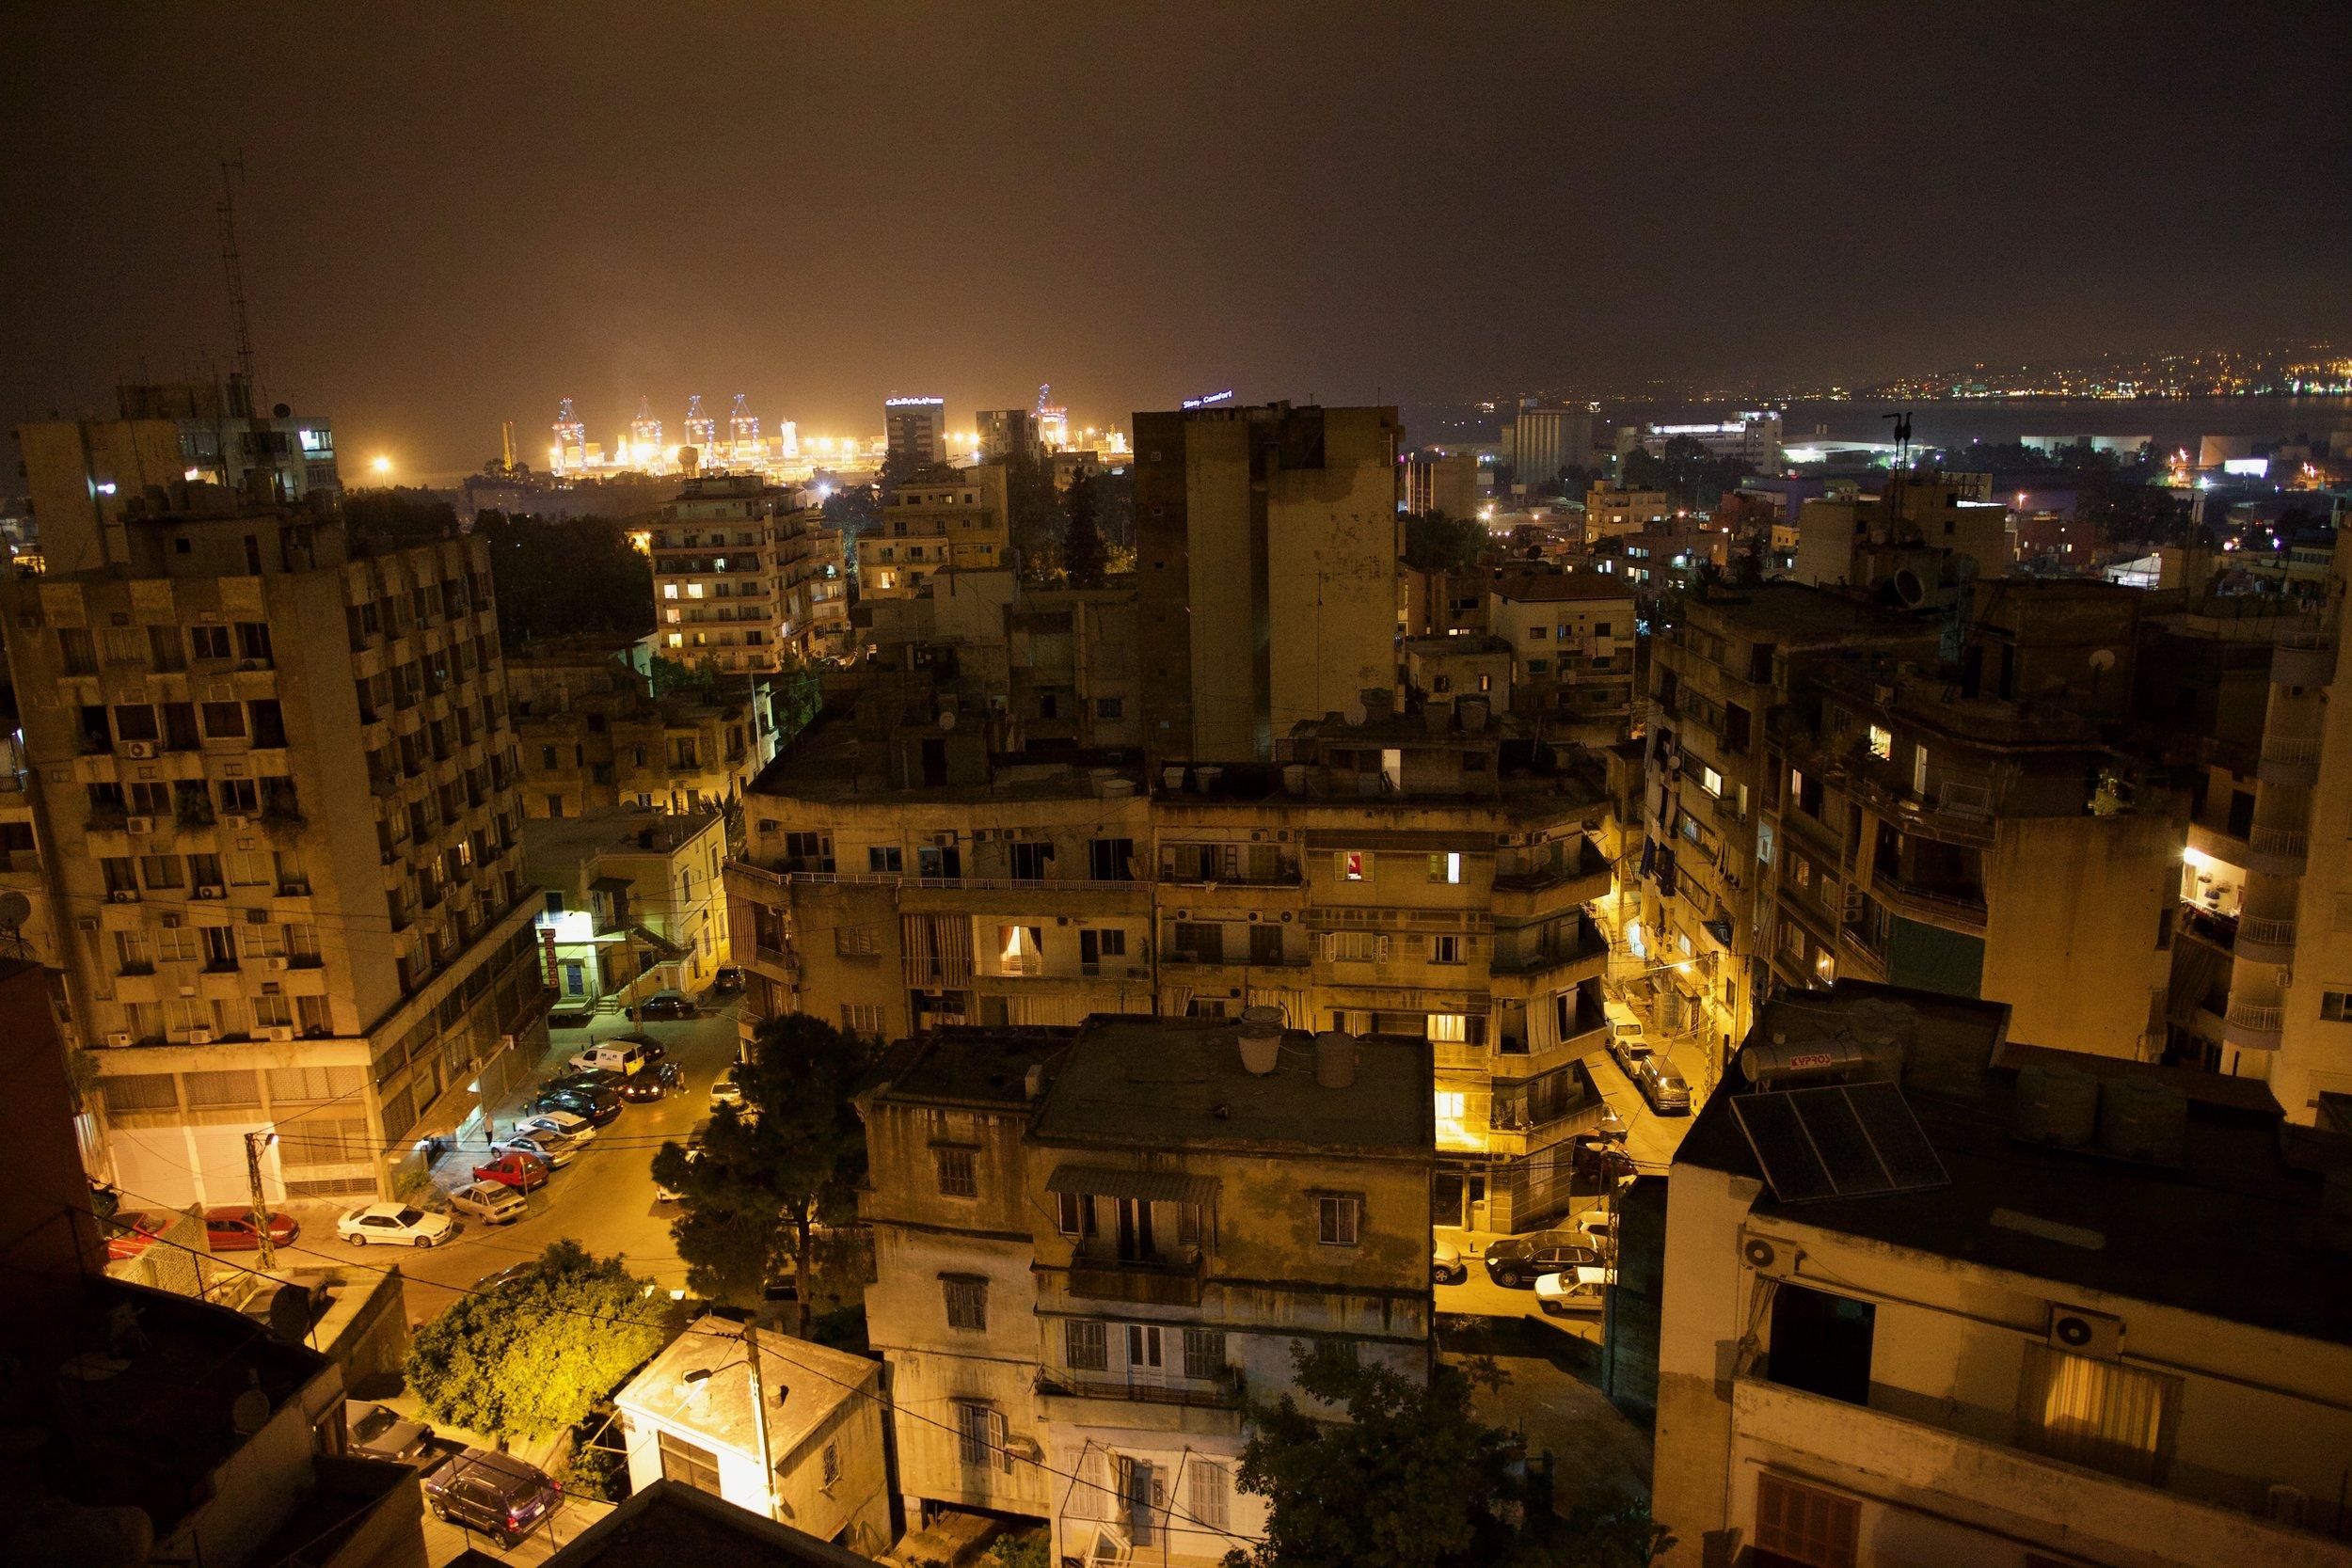 A view of Geitawi, a portside neighborhood in Beirut, Lebanon.